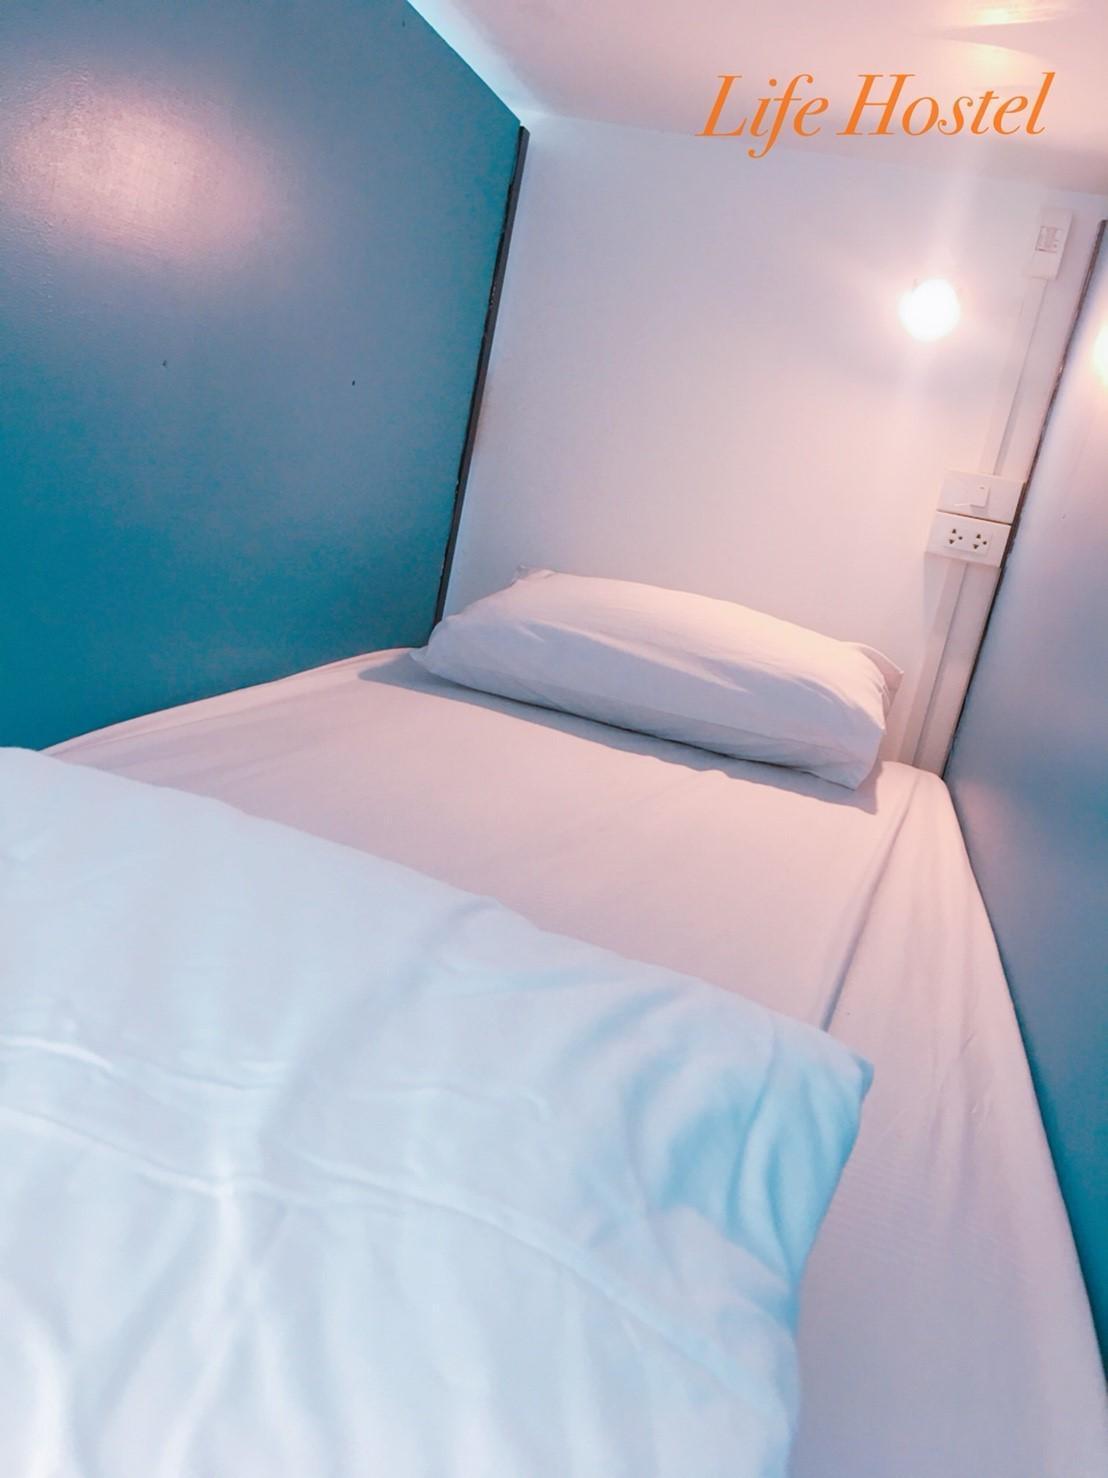 Life Hostel Bangkok Reviews